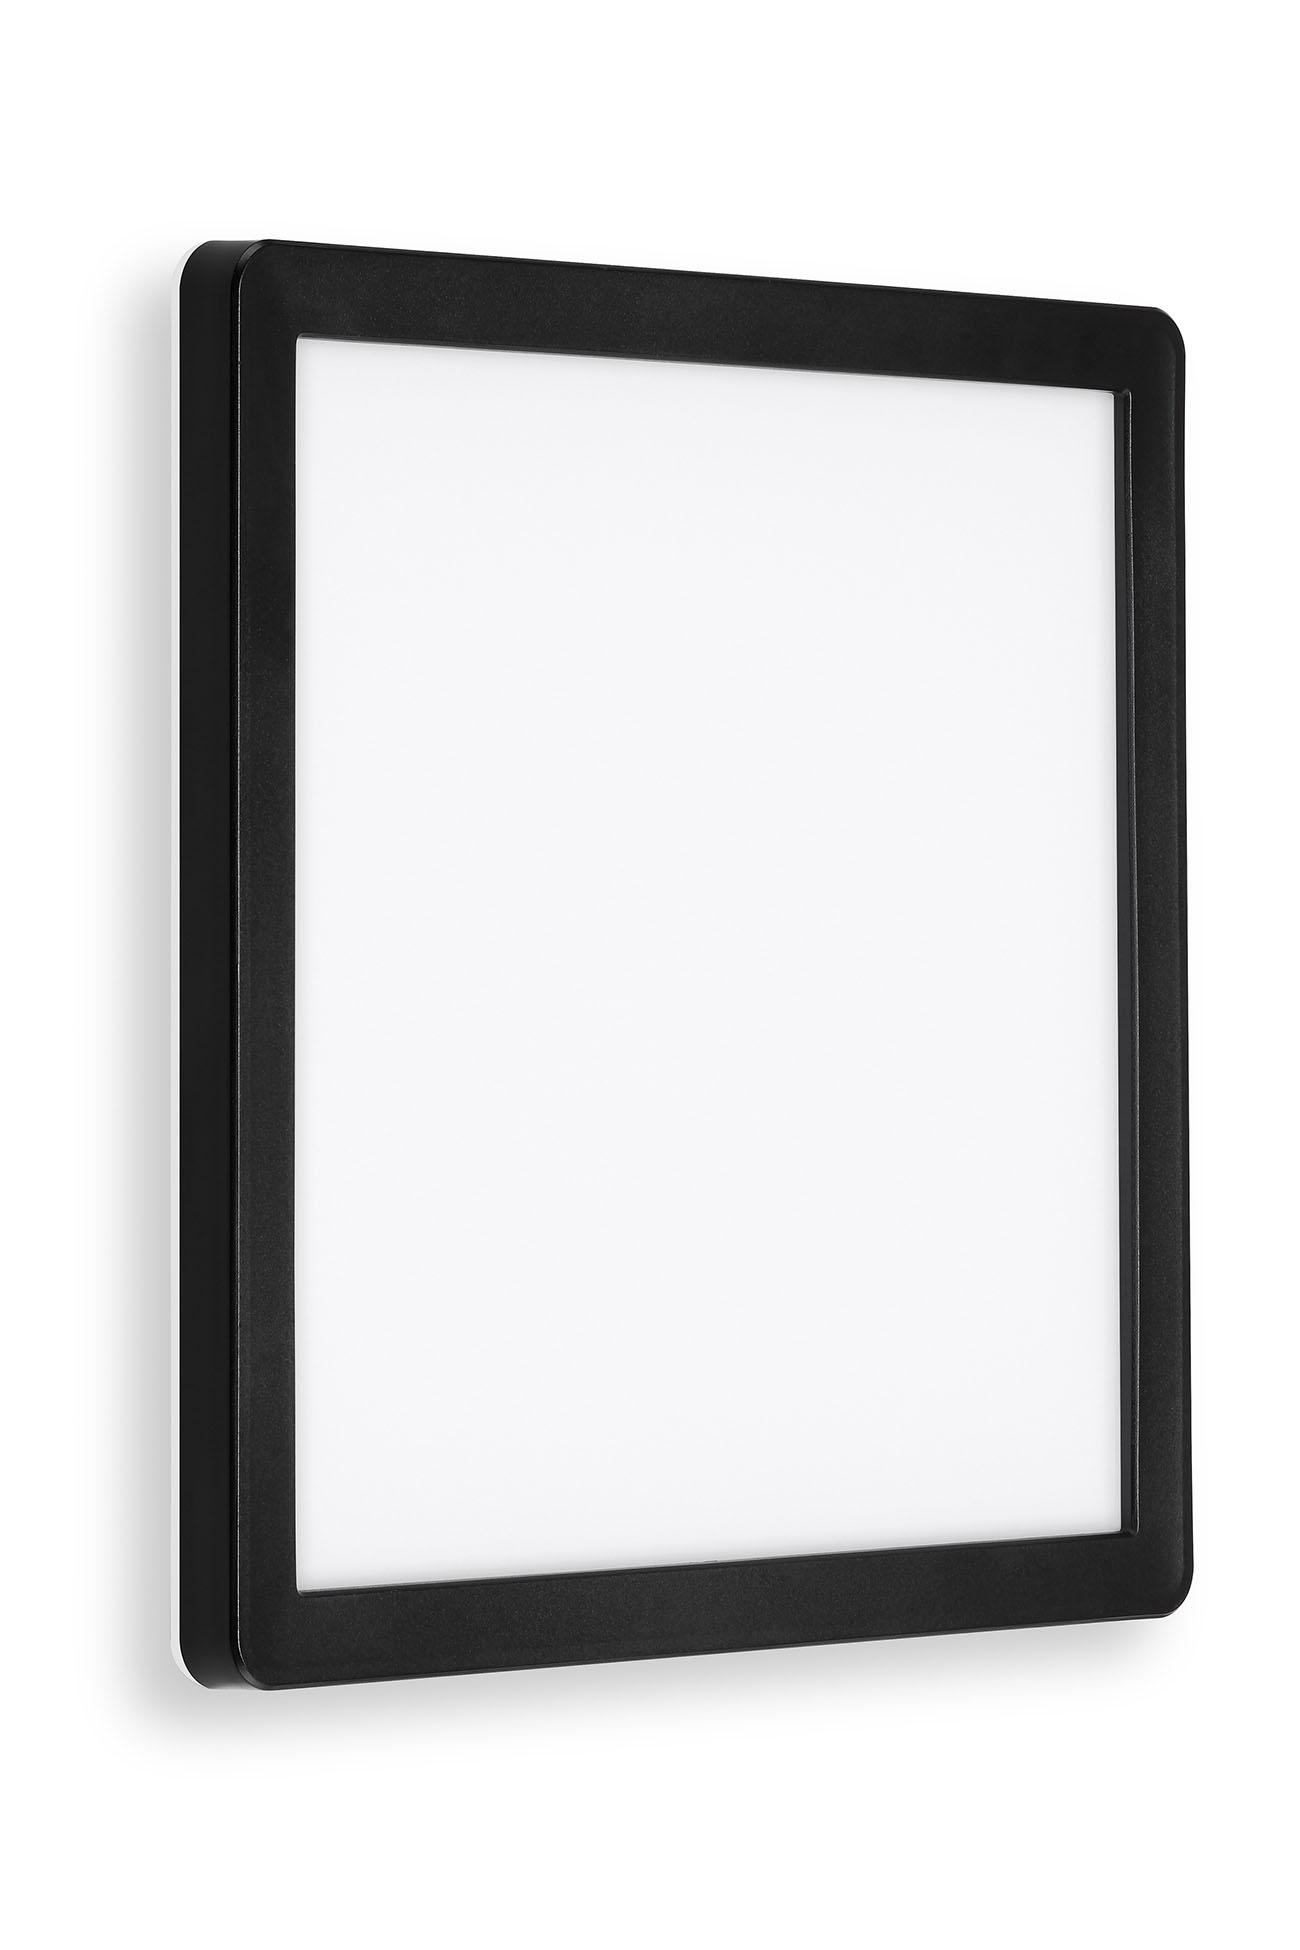 TELEFUNKEN LED Aussenwandleuchte, 25 cm, 15 W, Schwarz